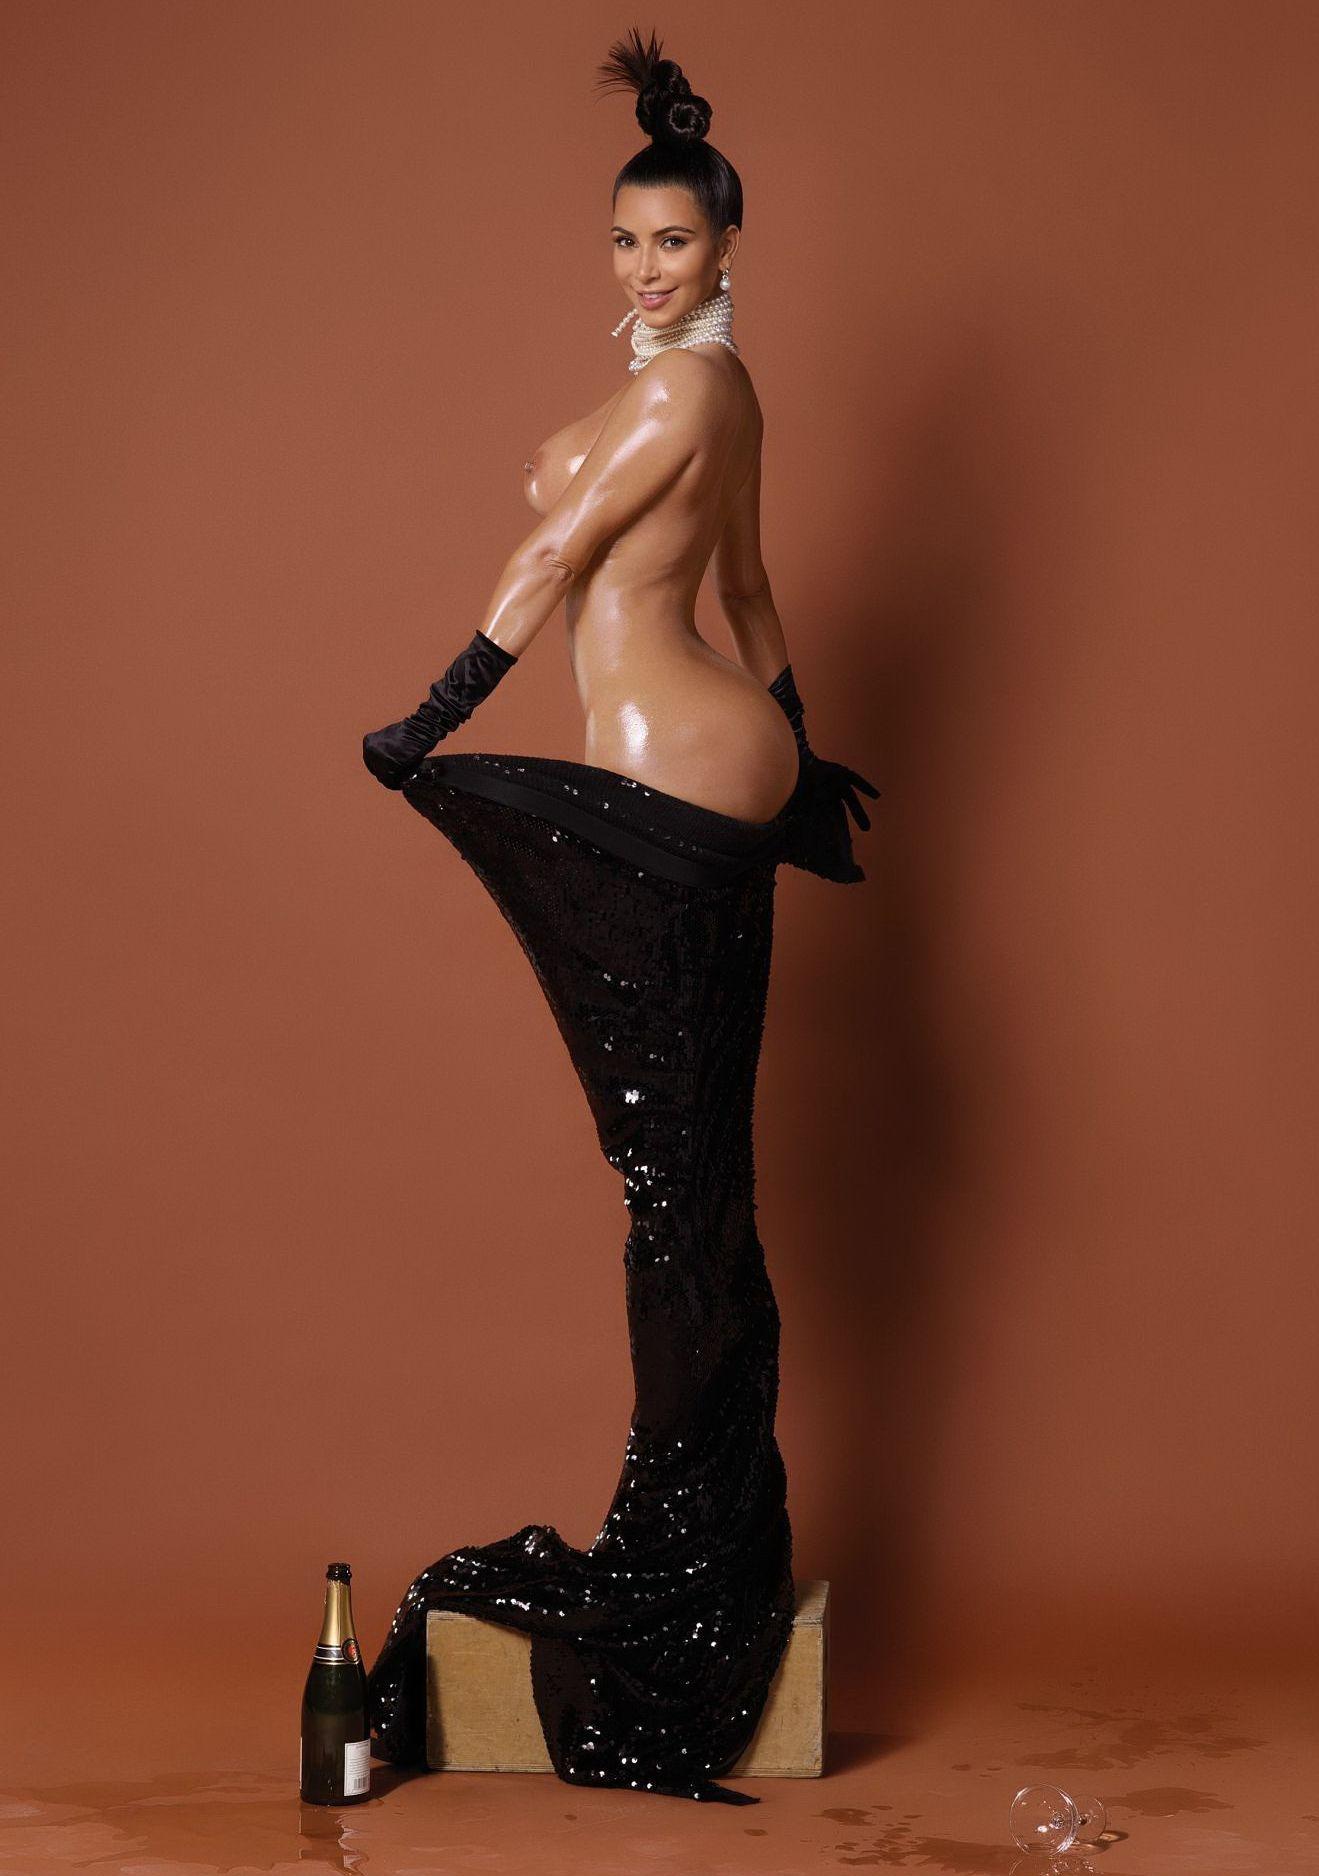 Kim Kardashian / Ким Кардашян фото полуголая секси